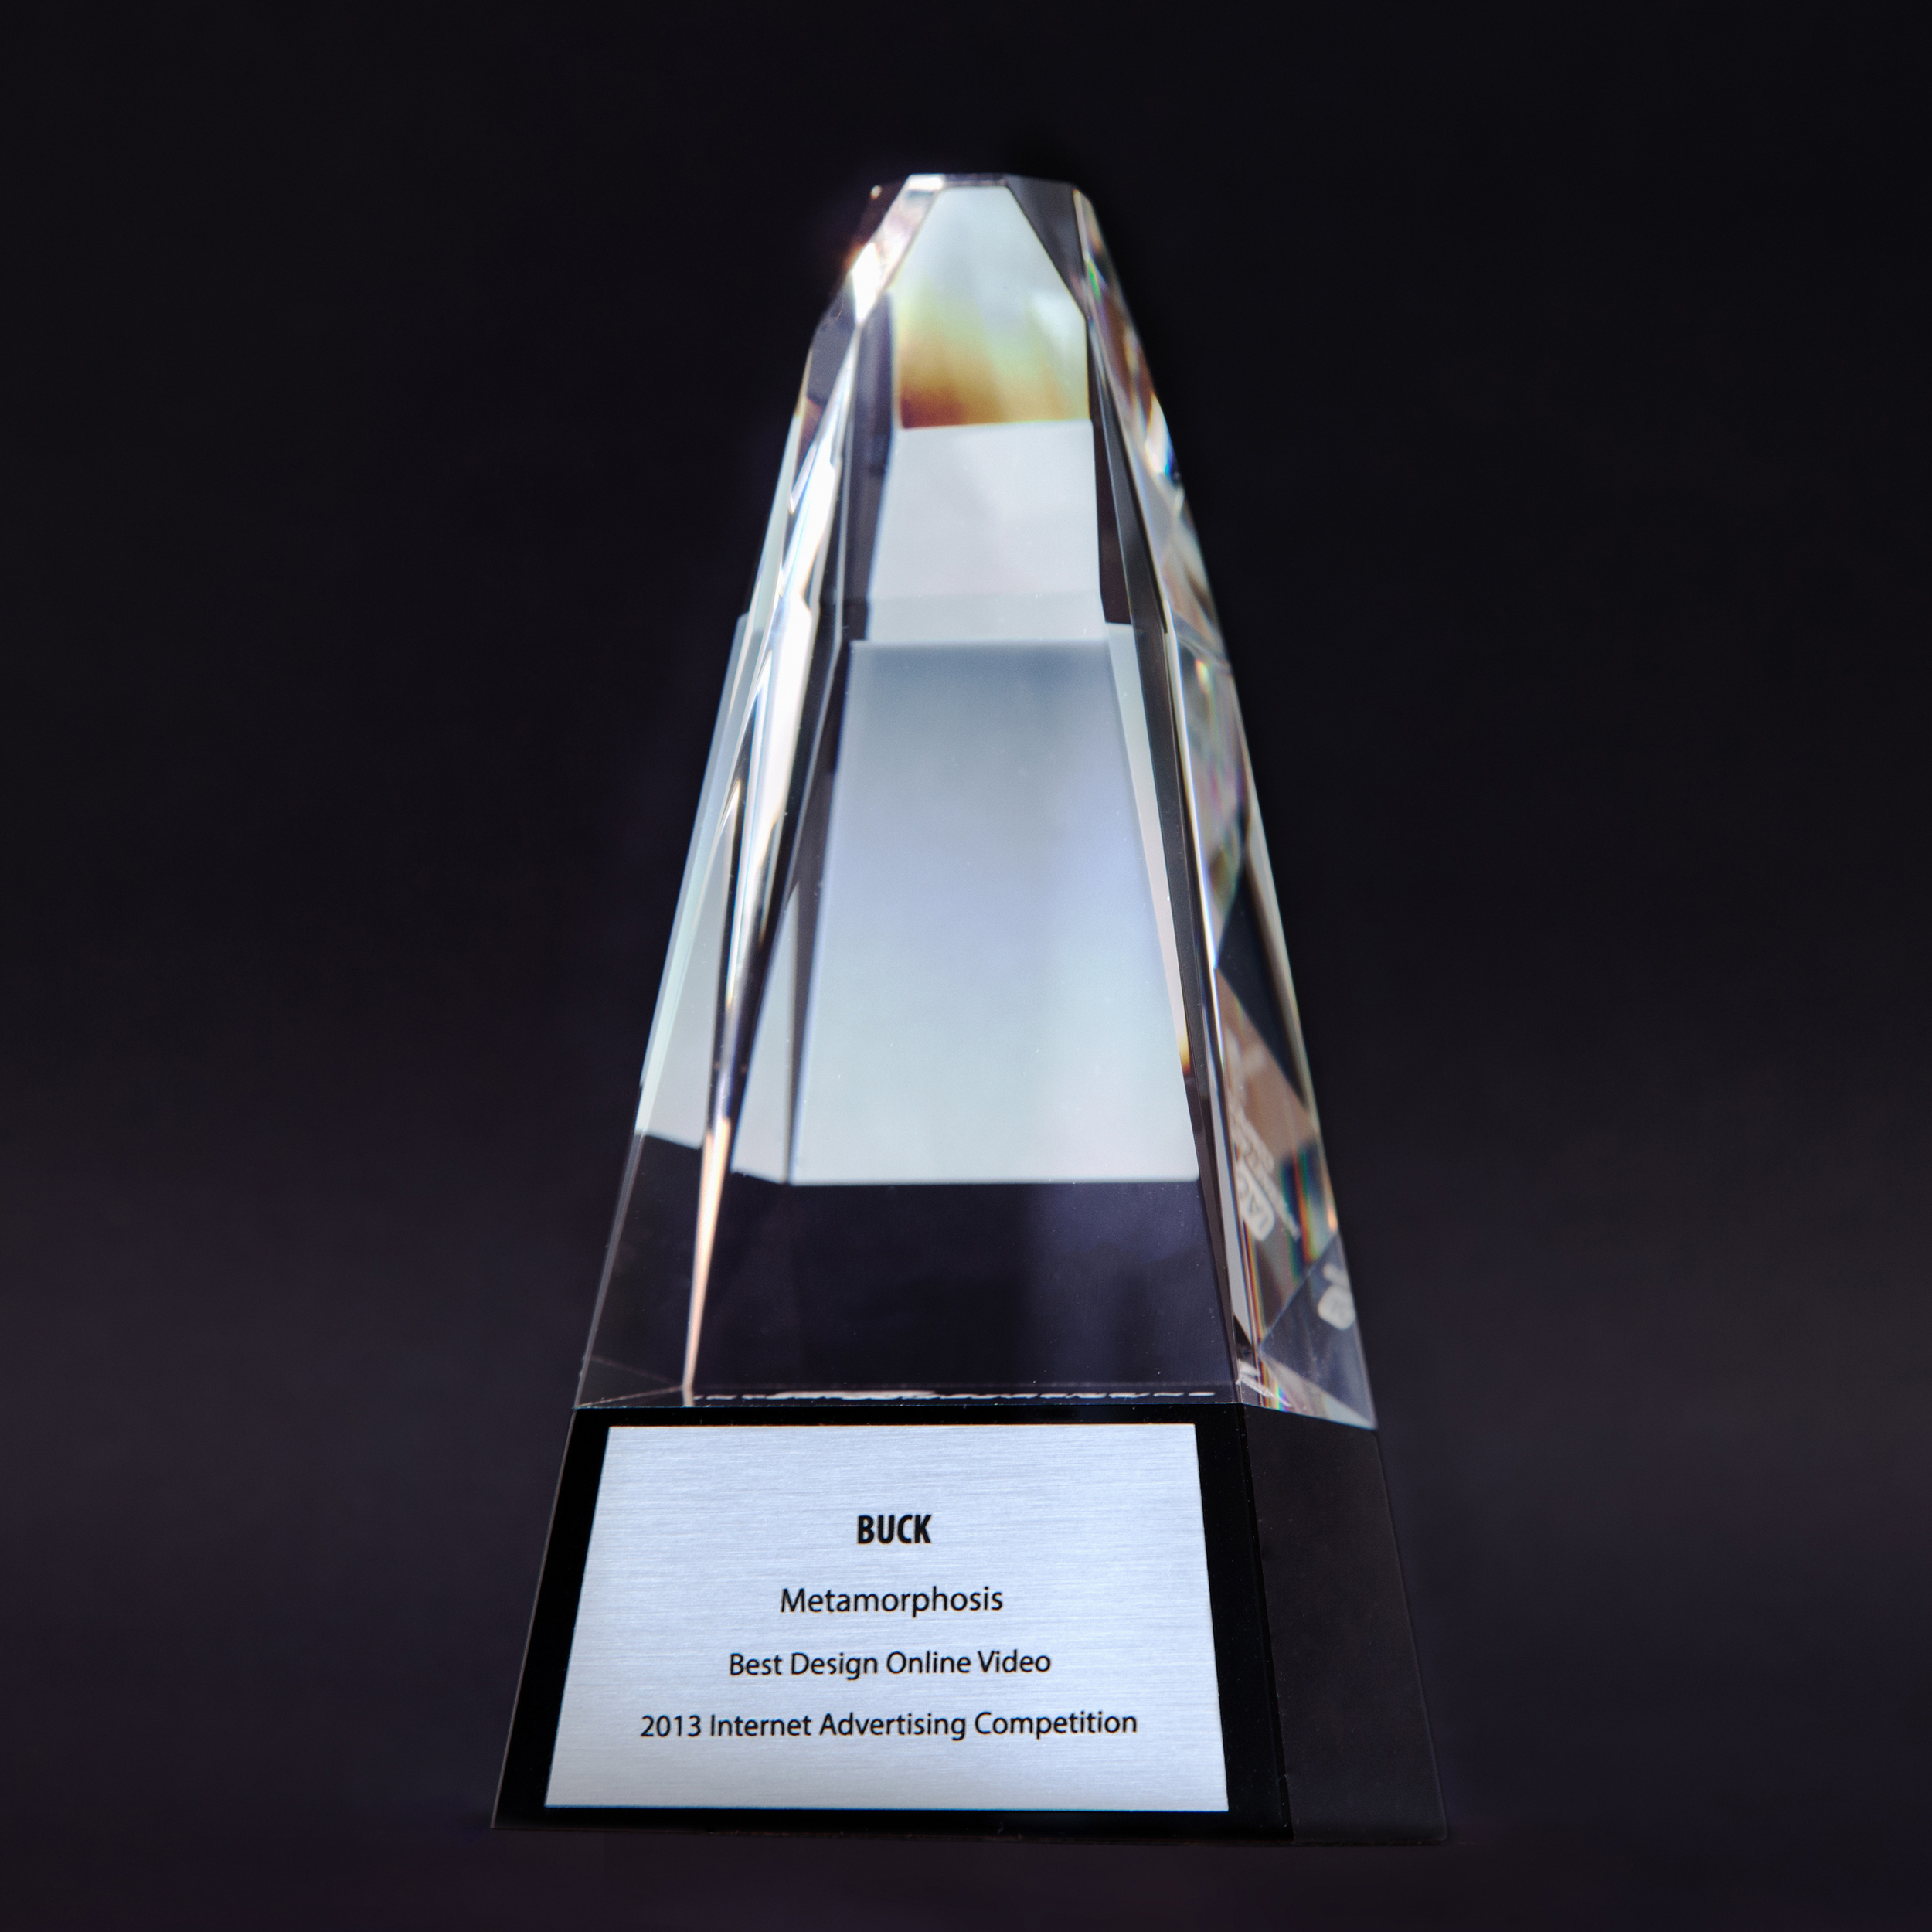 2013 Internet Advertising - Best Online Design